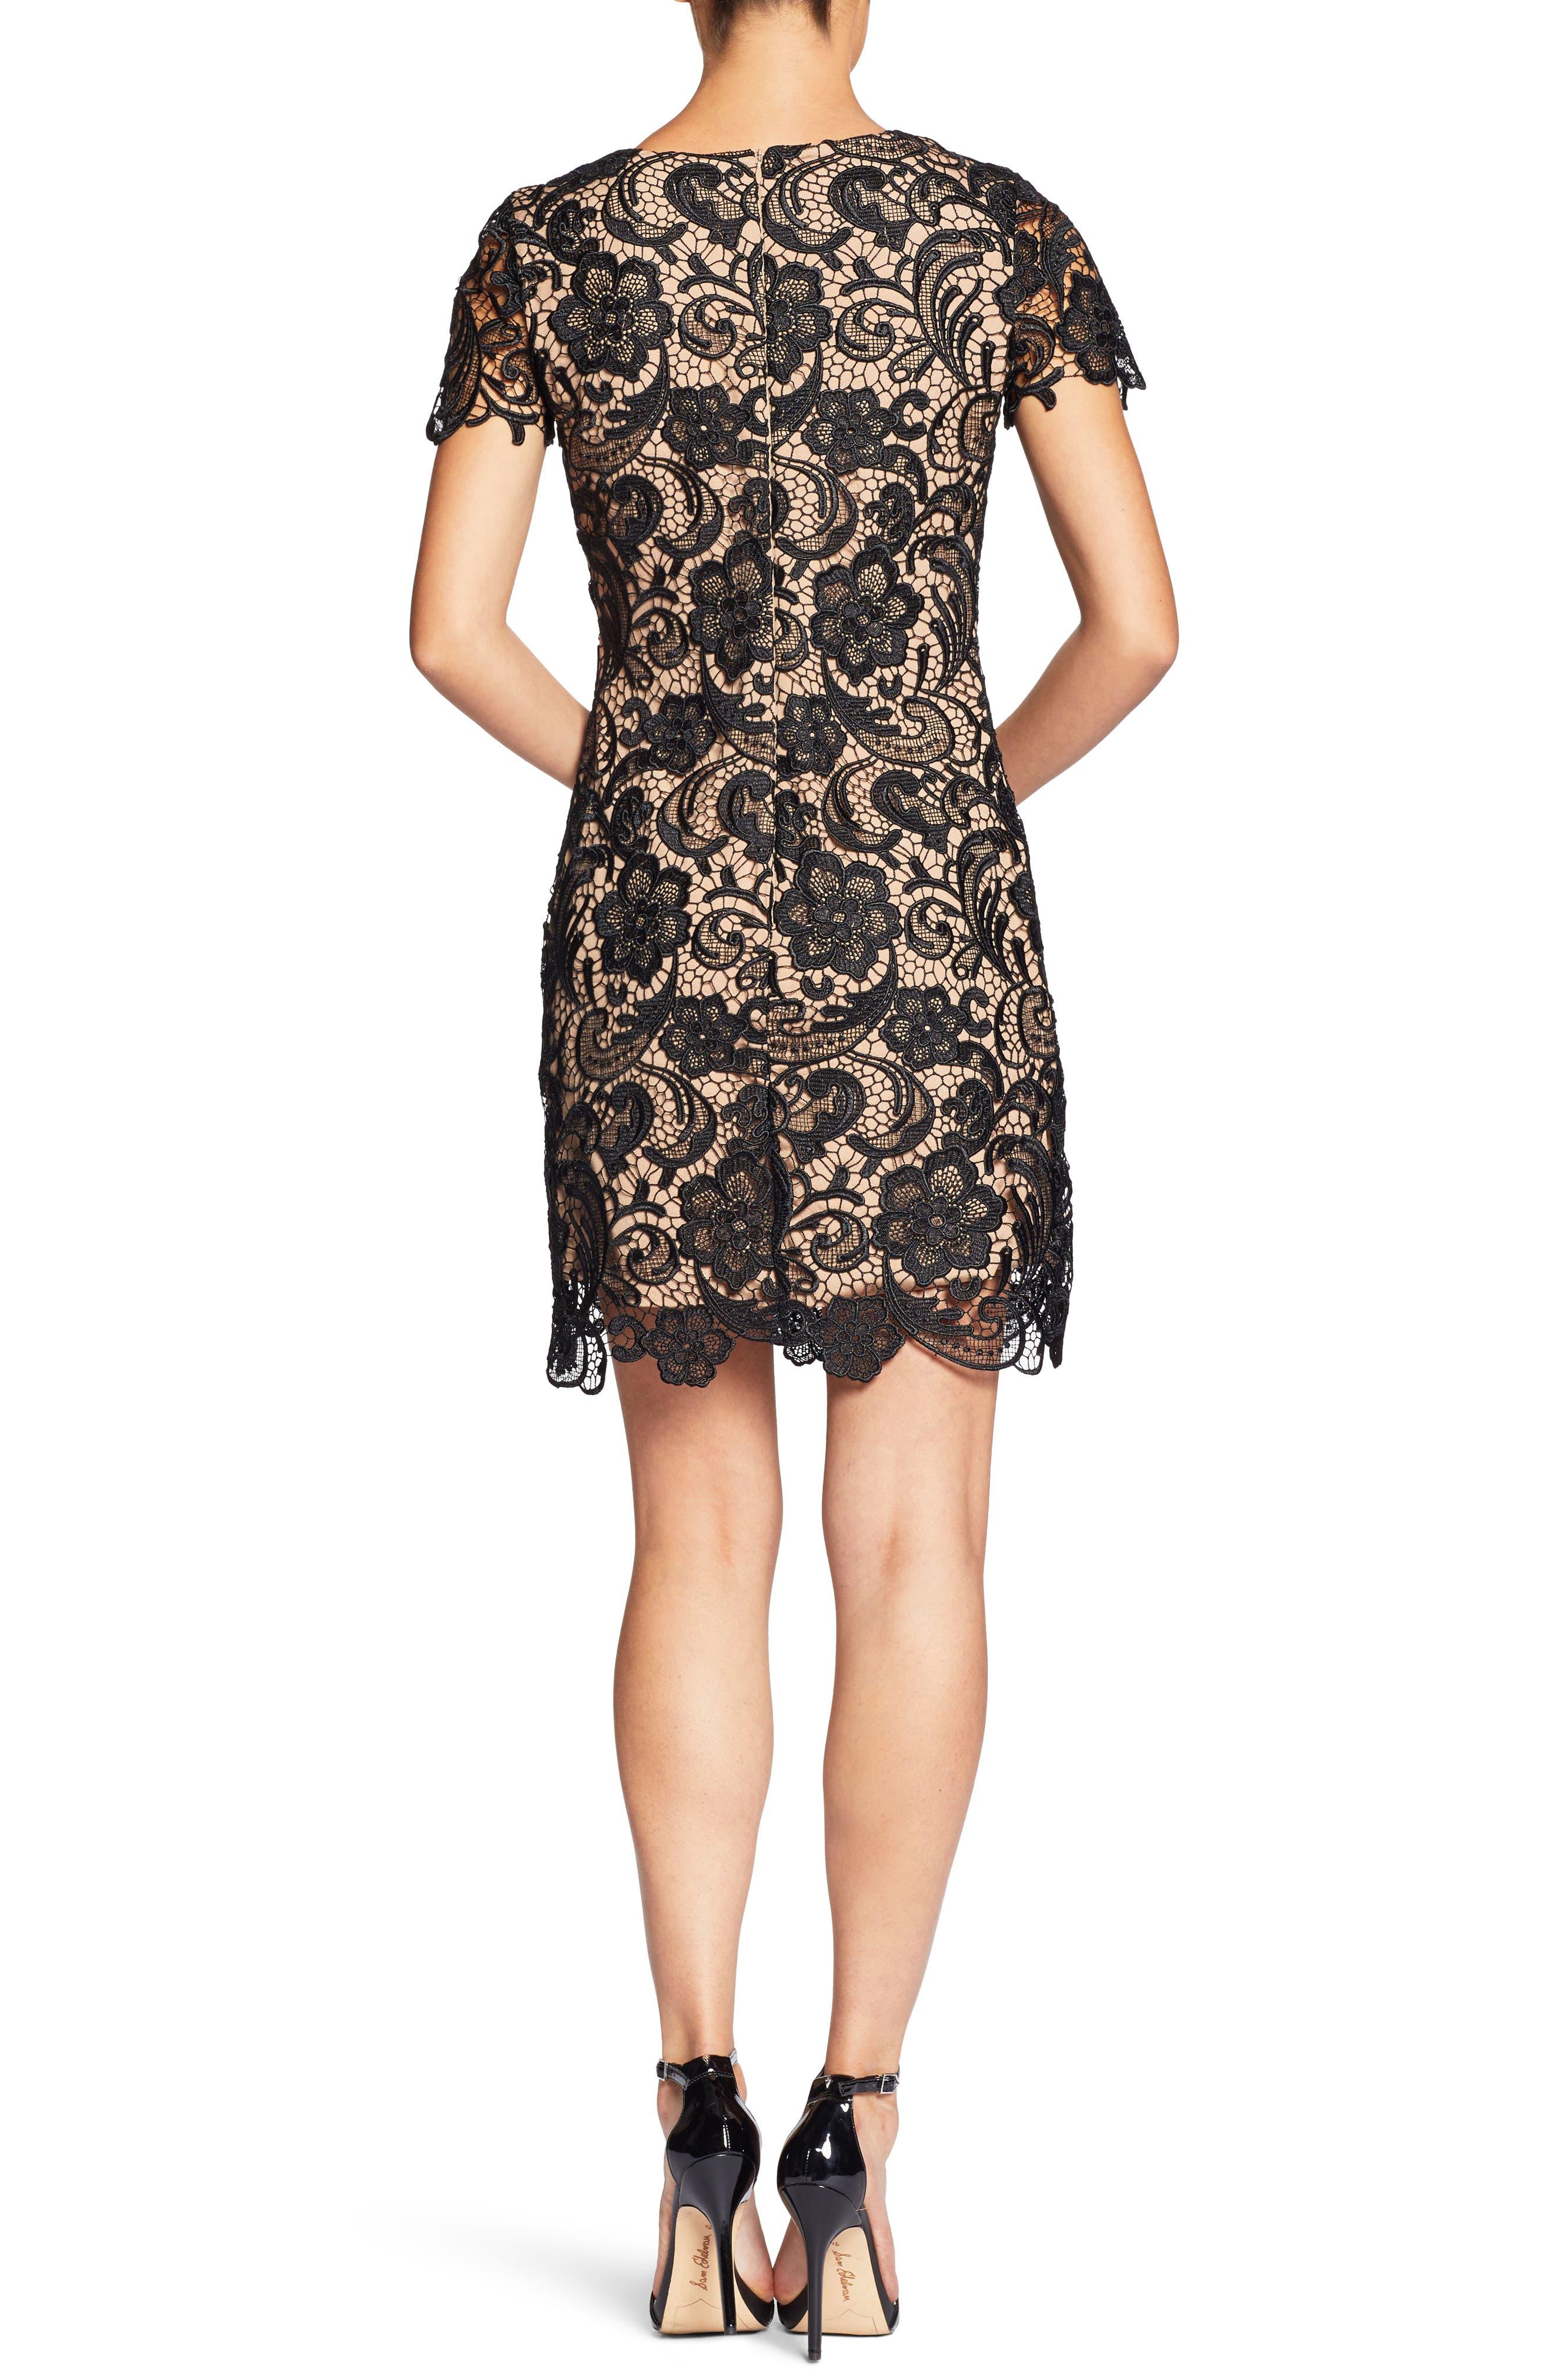 Anna Crochet Lace Sheath Dress,                             Alternate thumbnail 2, color,                             014